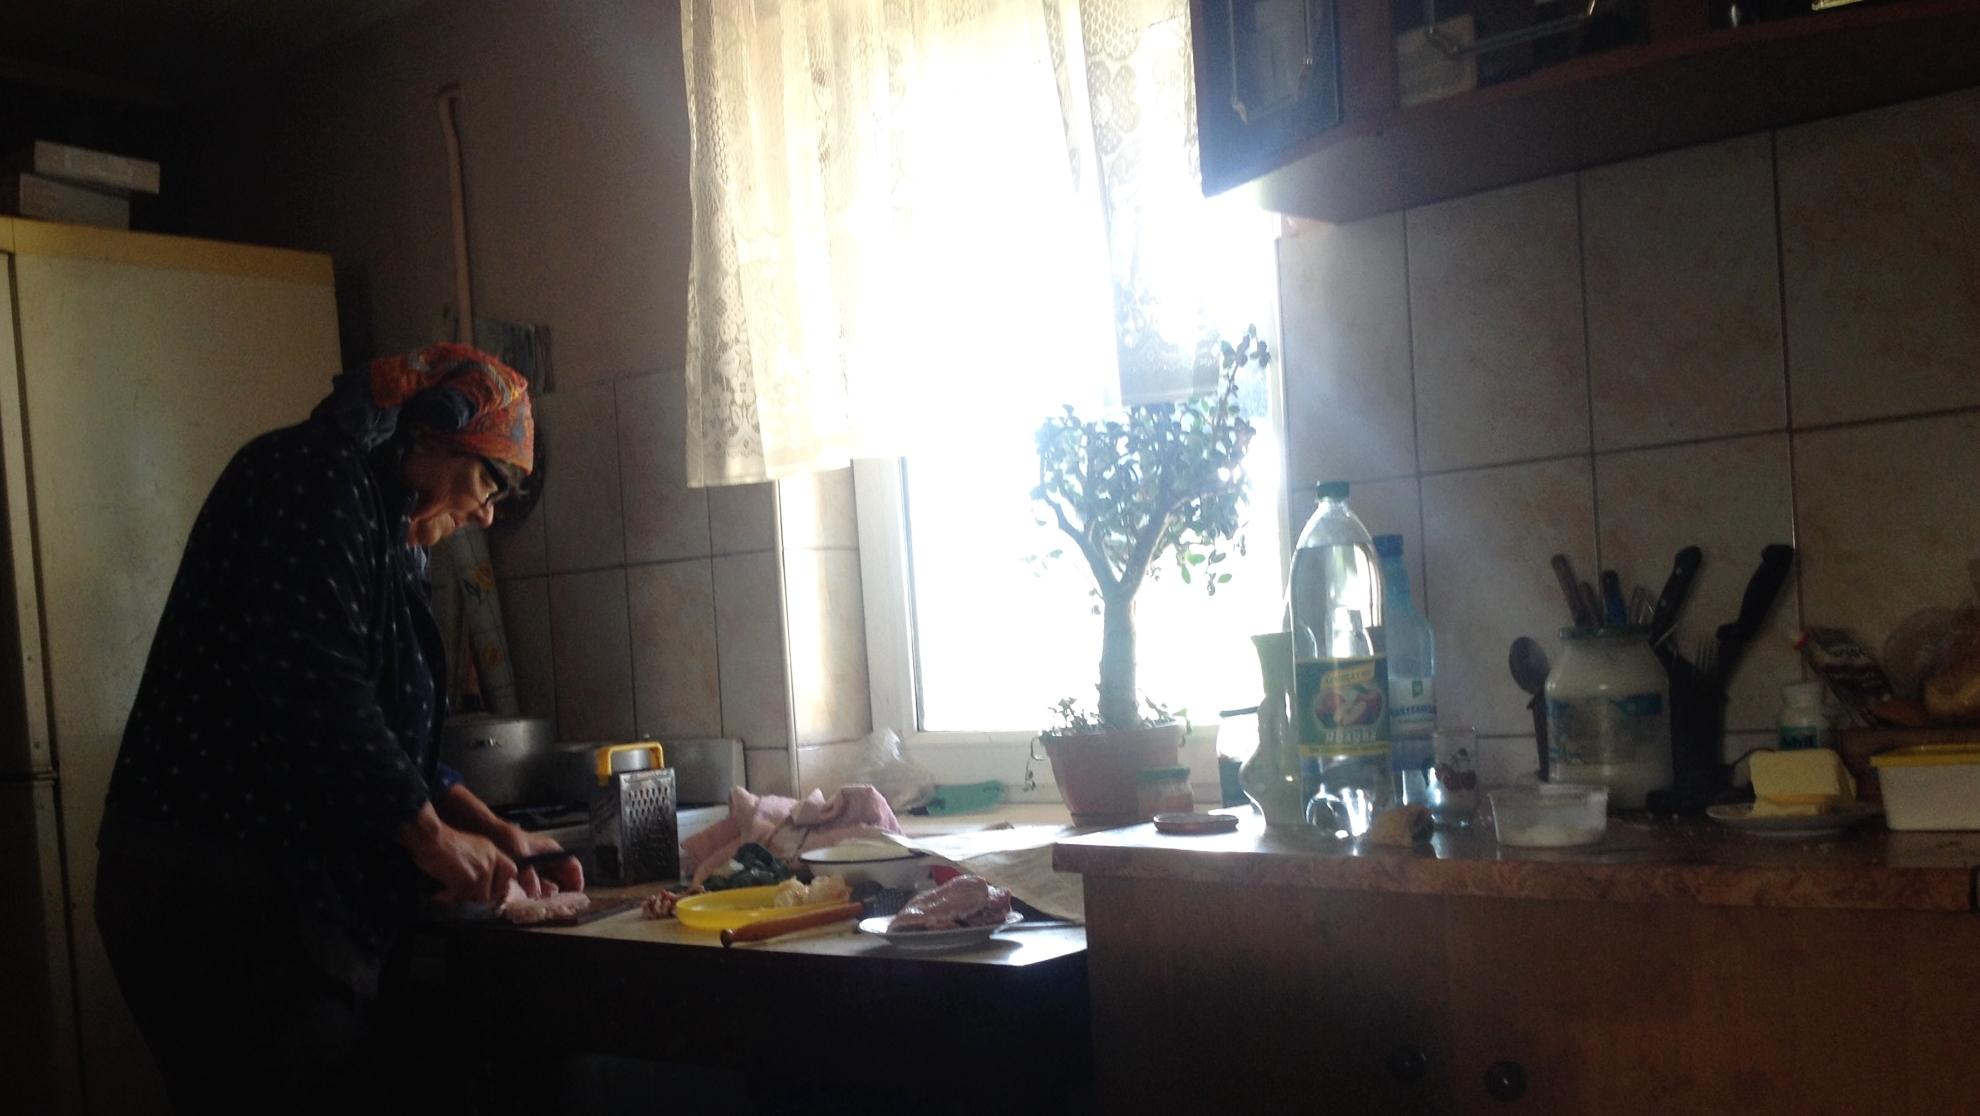 Hanna prepared food for me to take back to Lviv.